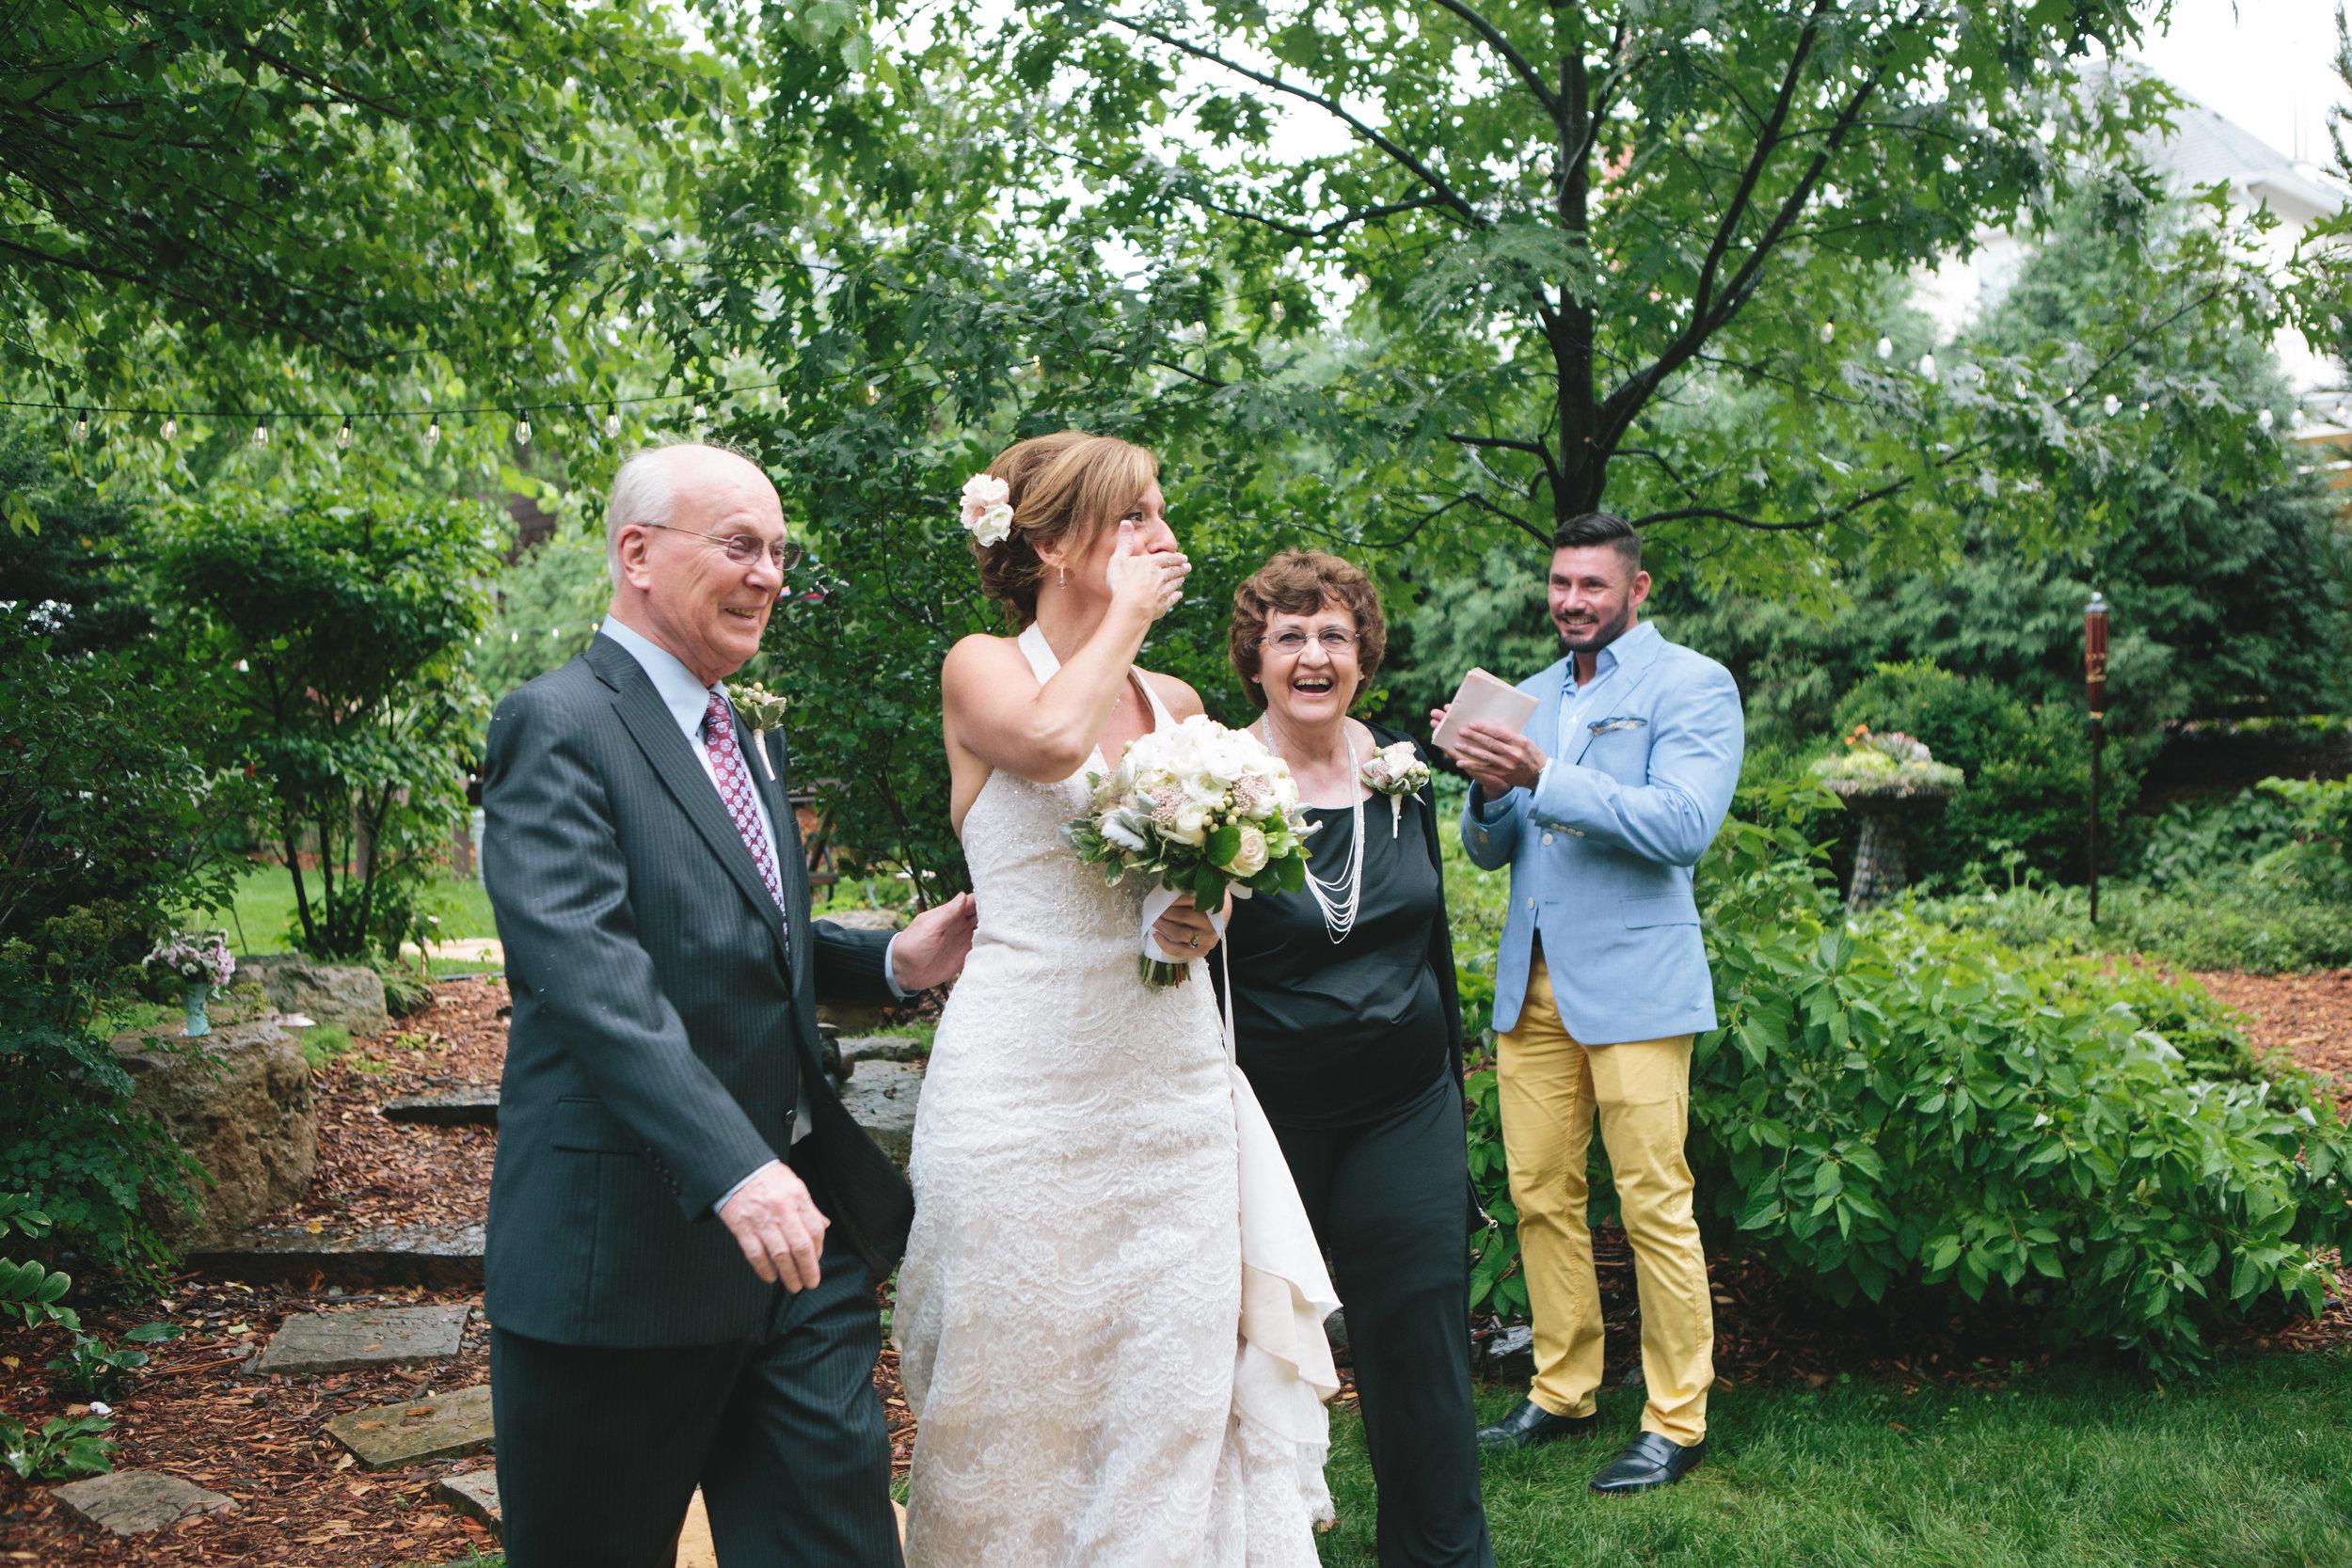 Lauren Baker Photography in case of rain on wedding don't stress